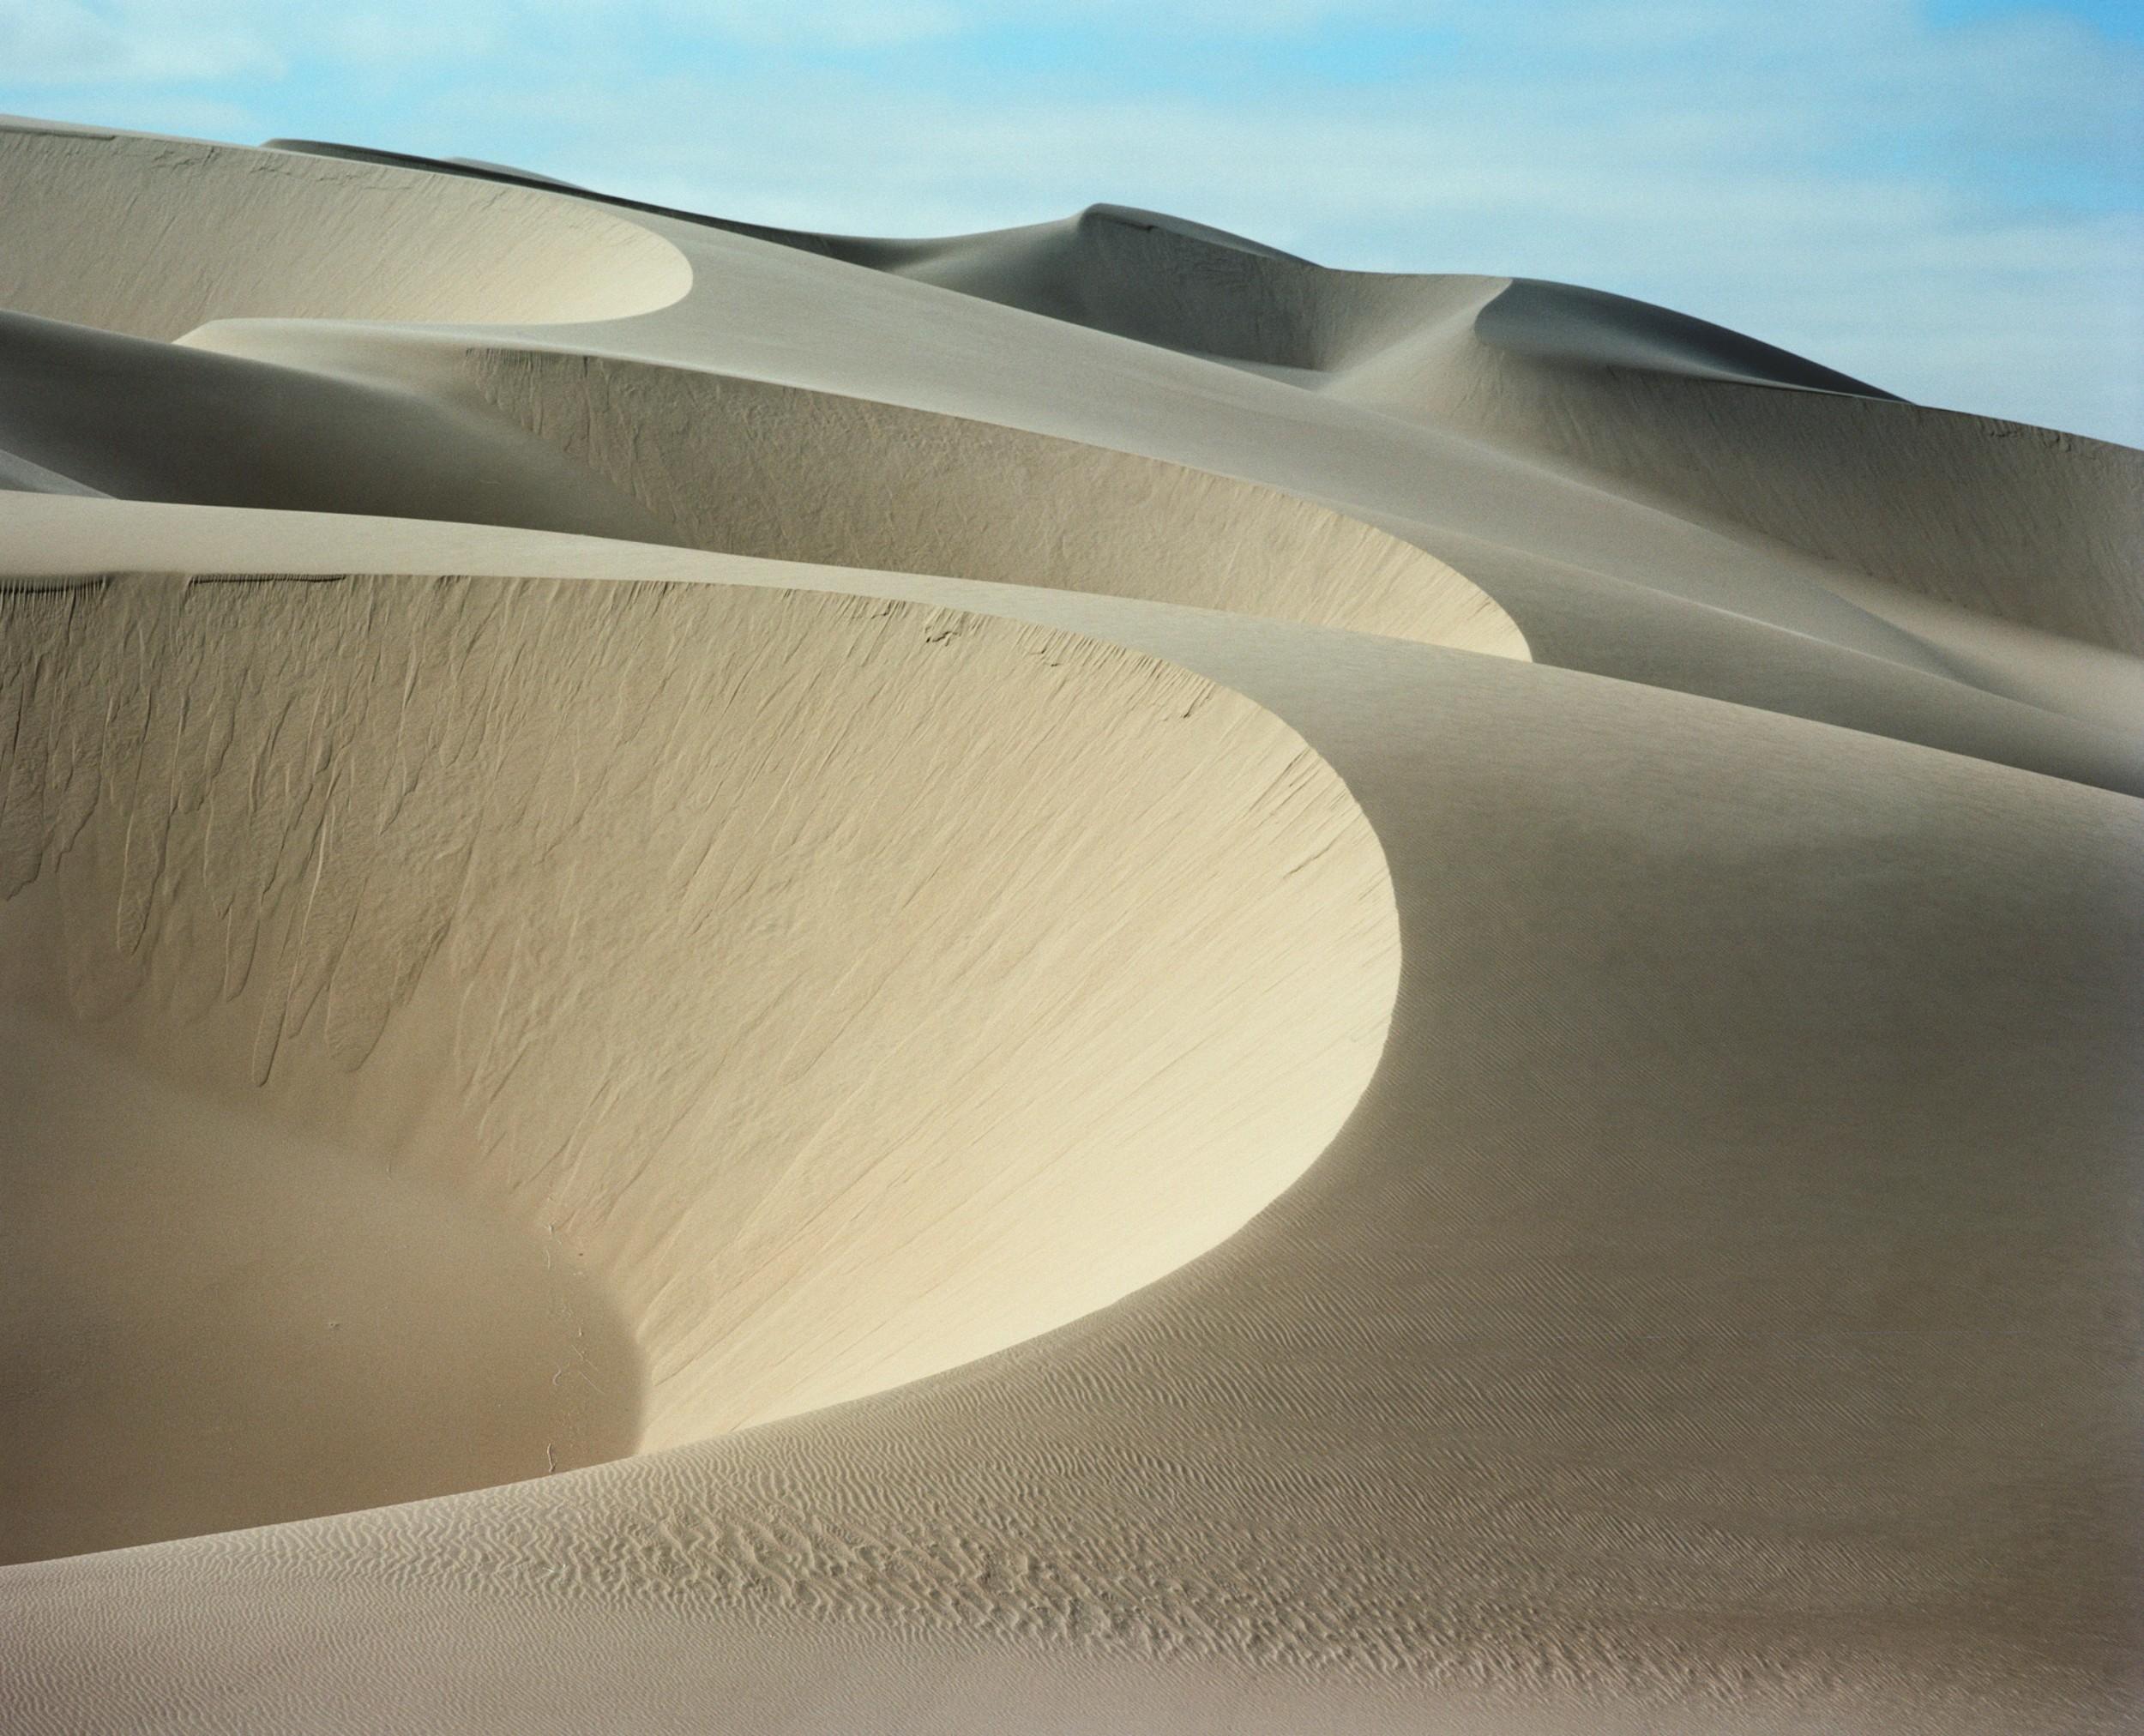 33Shipwreck Lodge - Landscapes - Iconic desert dunes.jpg